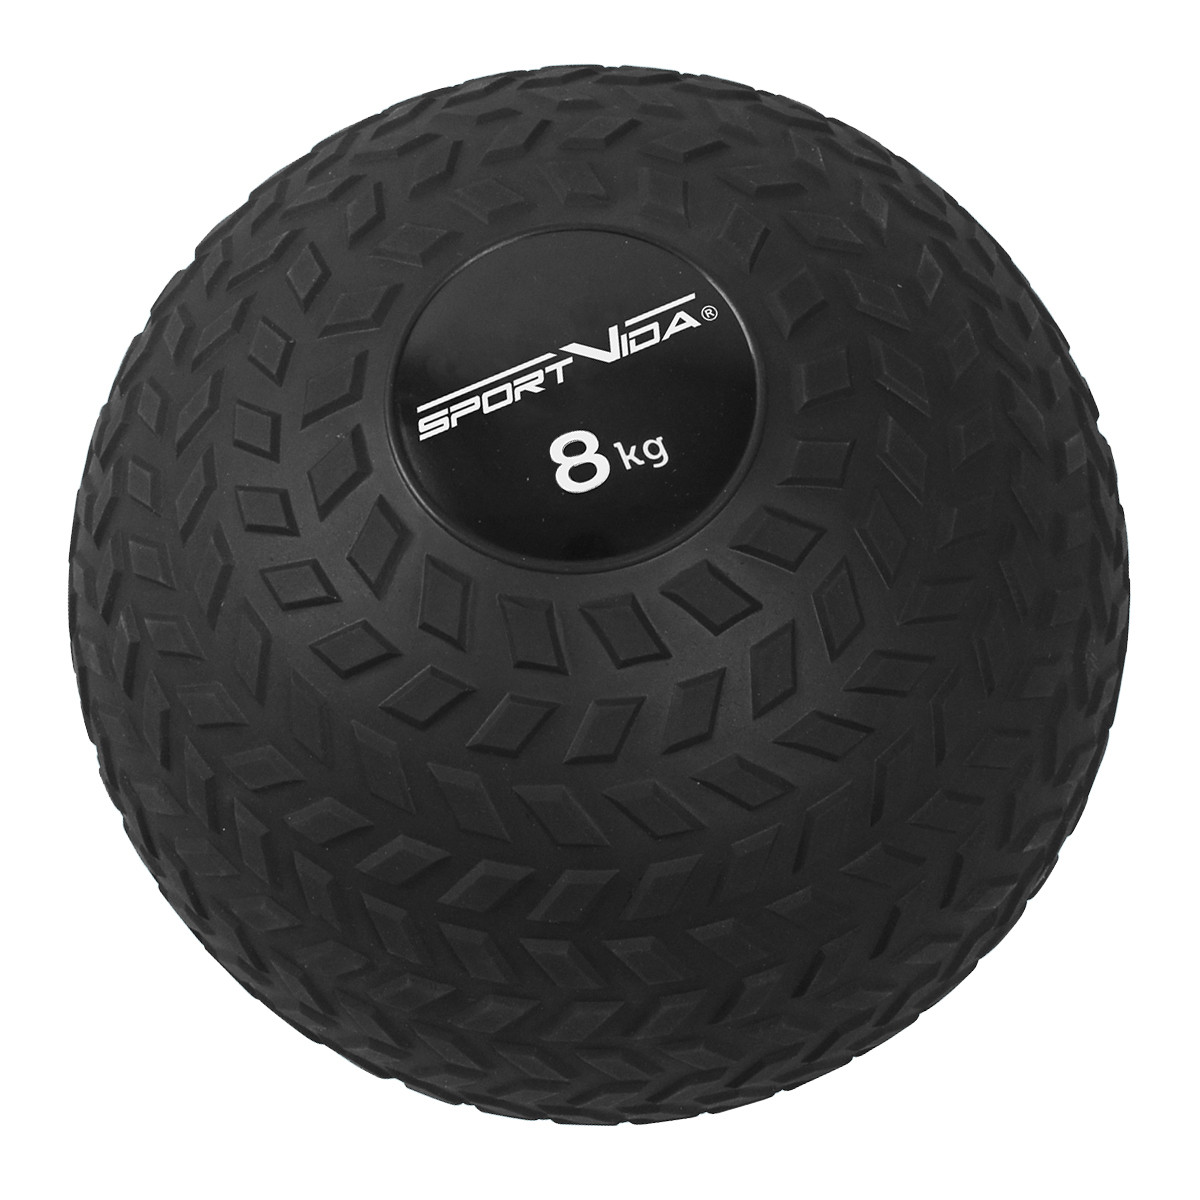 Слэмбол (медицинский мяч) для кроссфита SportVida Slam Ball 8 кг SV-HK0350 Black